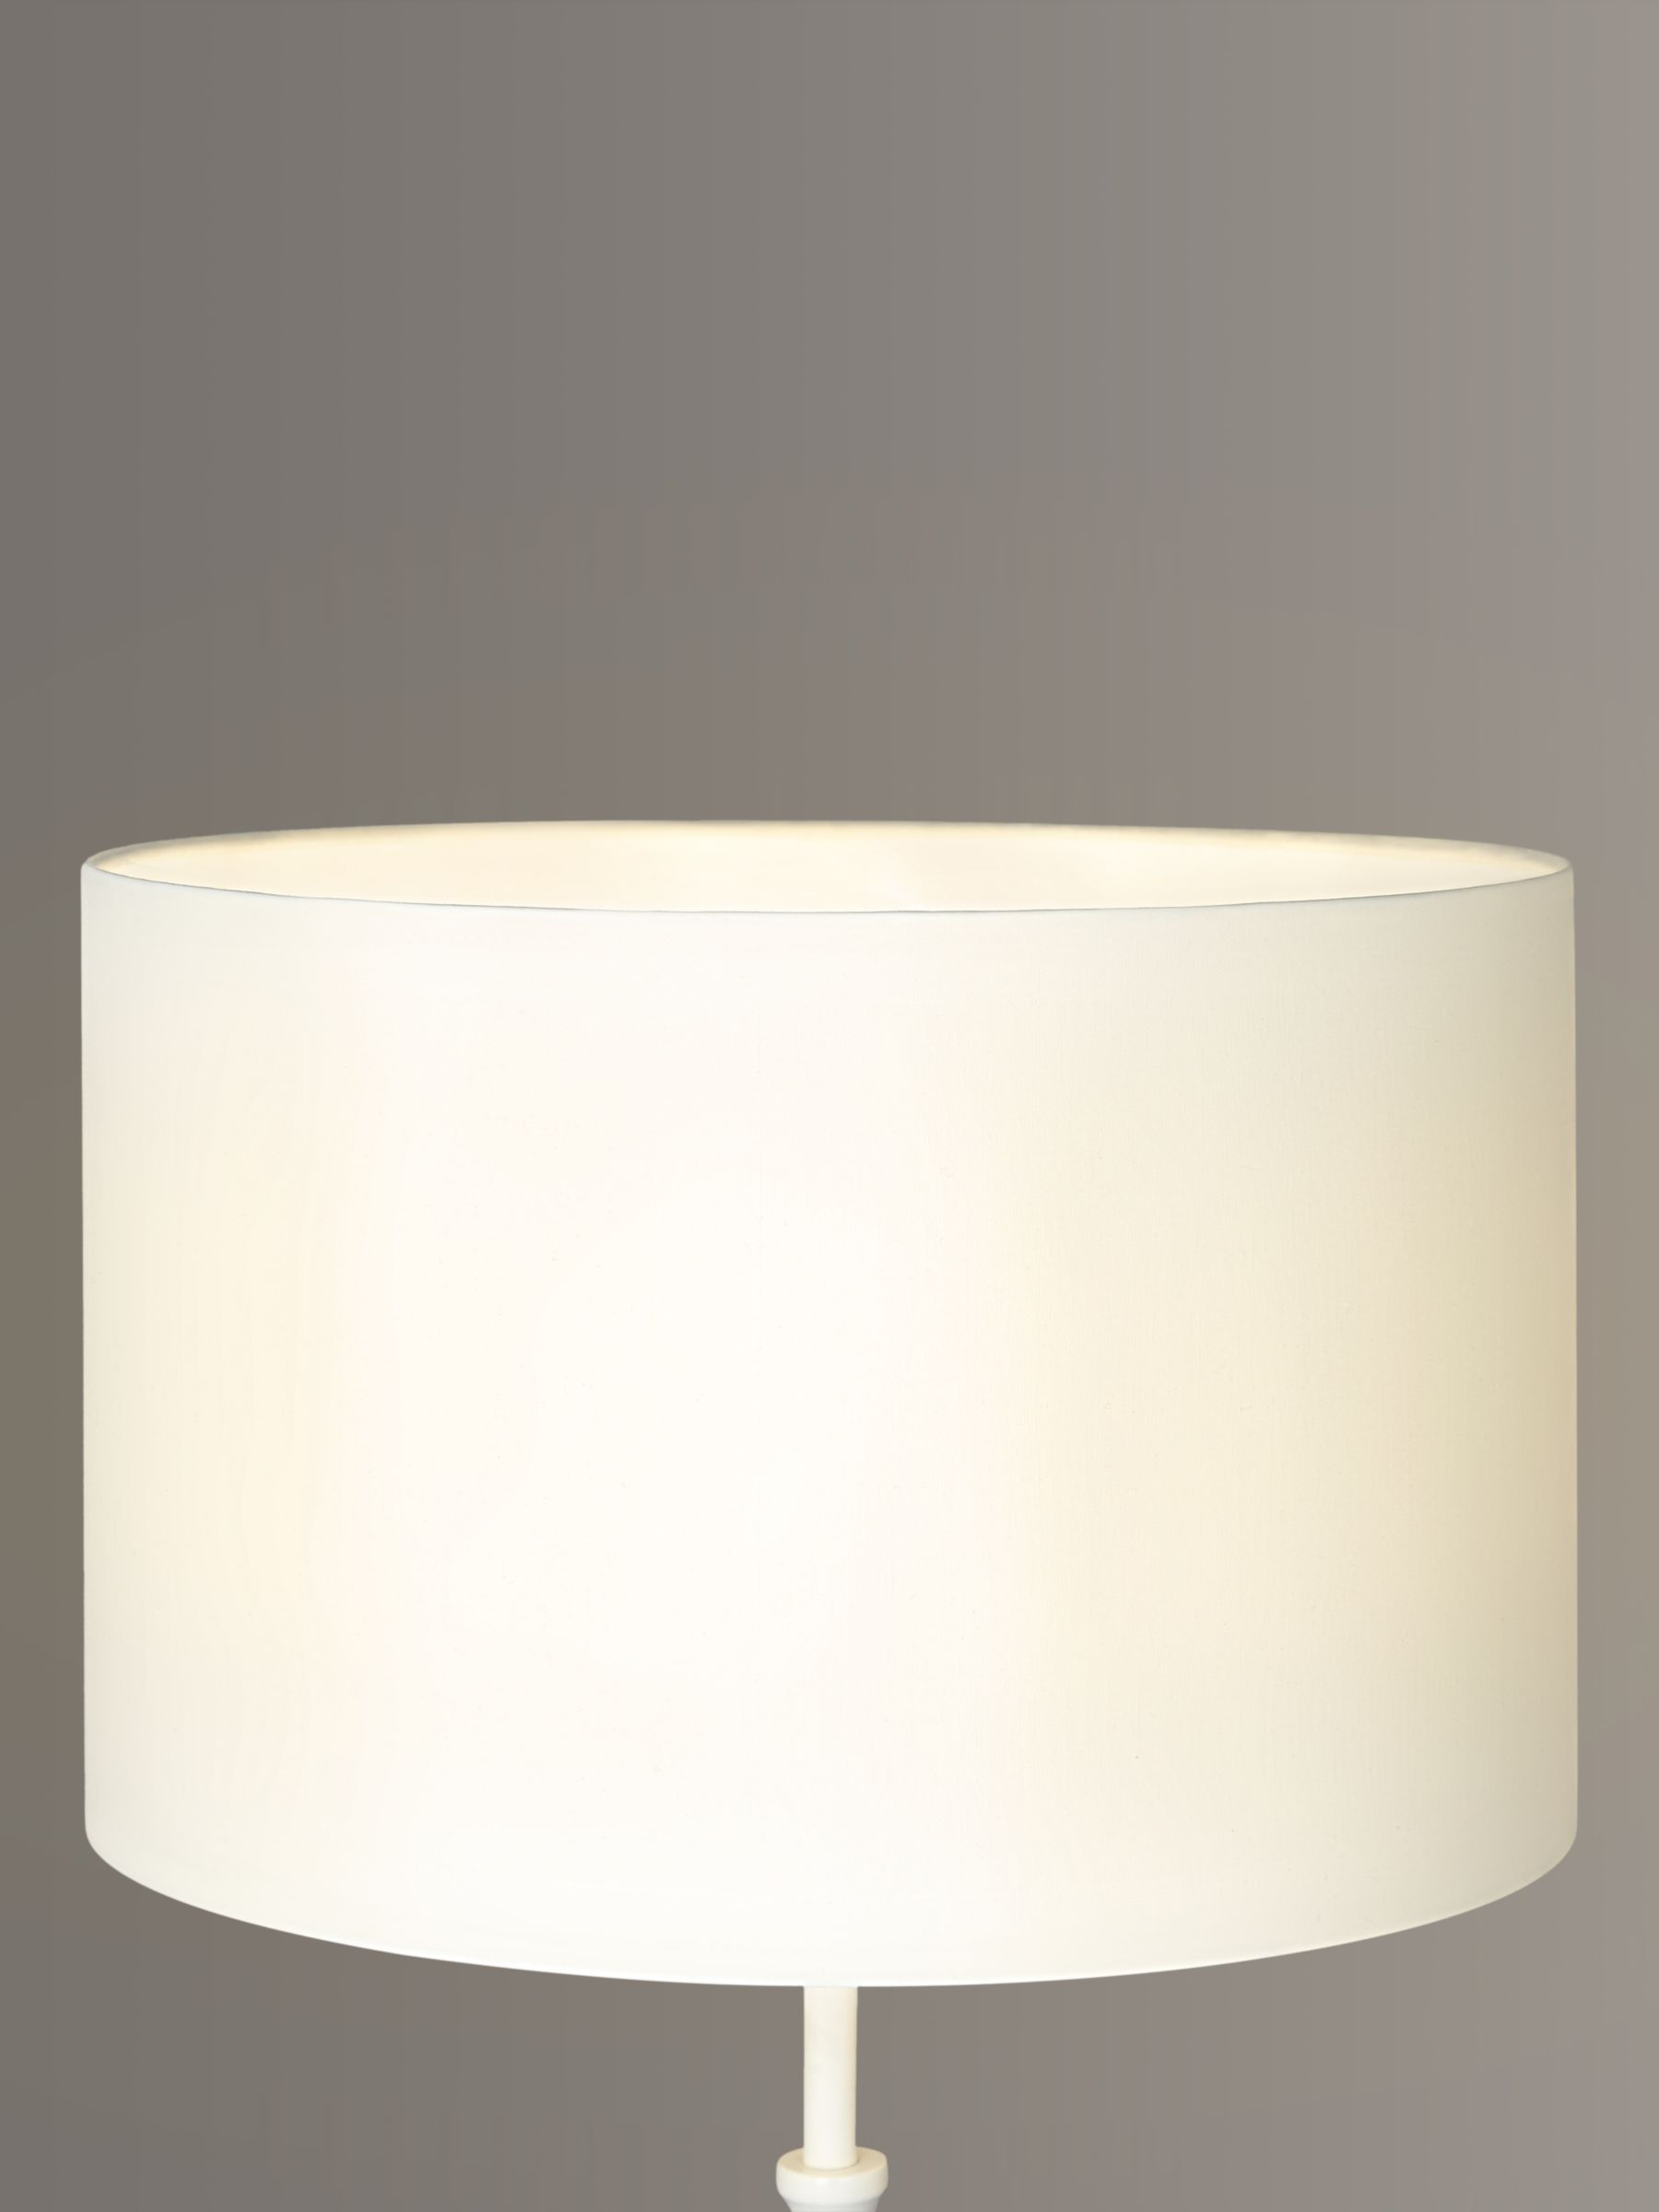 Anyday John Lewis Partners Mimi, Modern Lamp Shades Uk